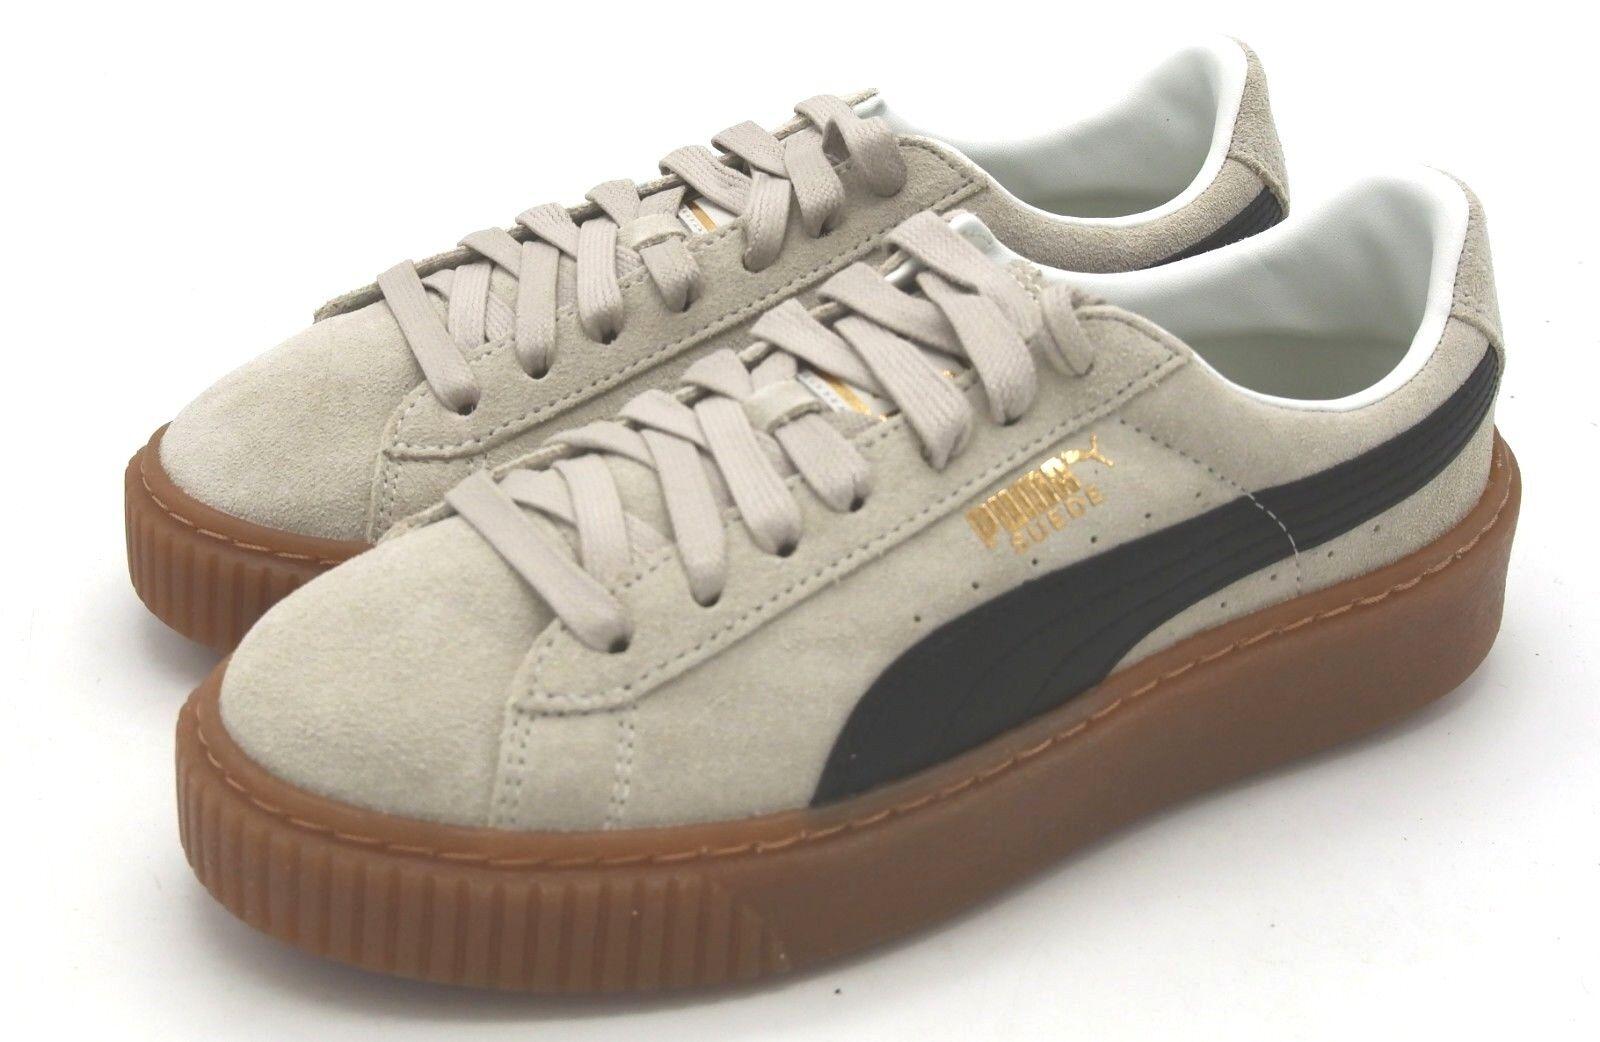 New Women's Puma Suede Platform Core Whisper White Puma Black Sneaker 10 M